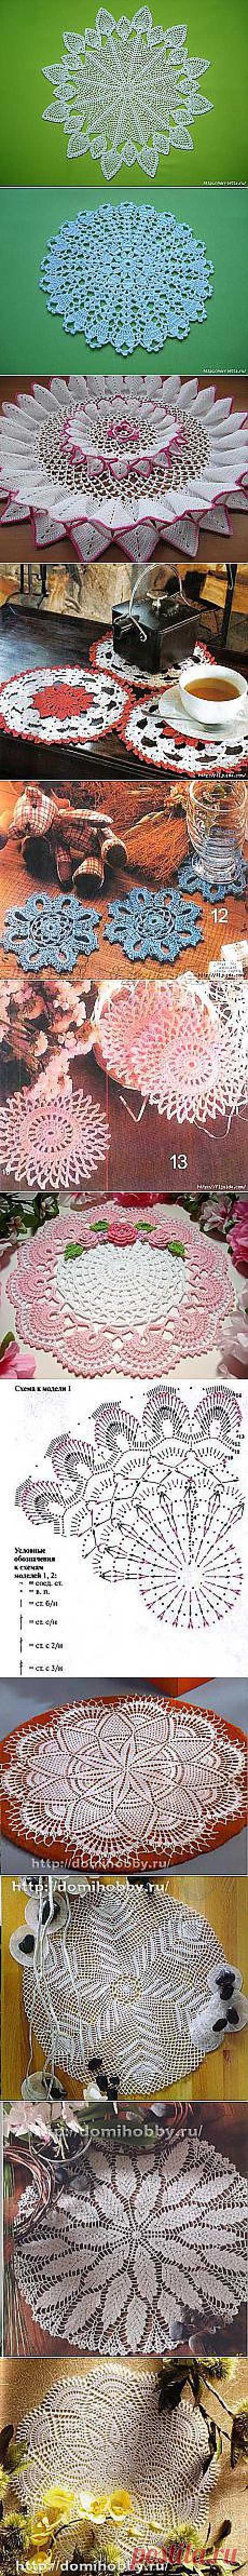 крючком natalia igochewa: салфетки | Постила.ru